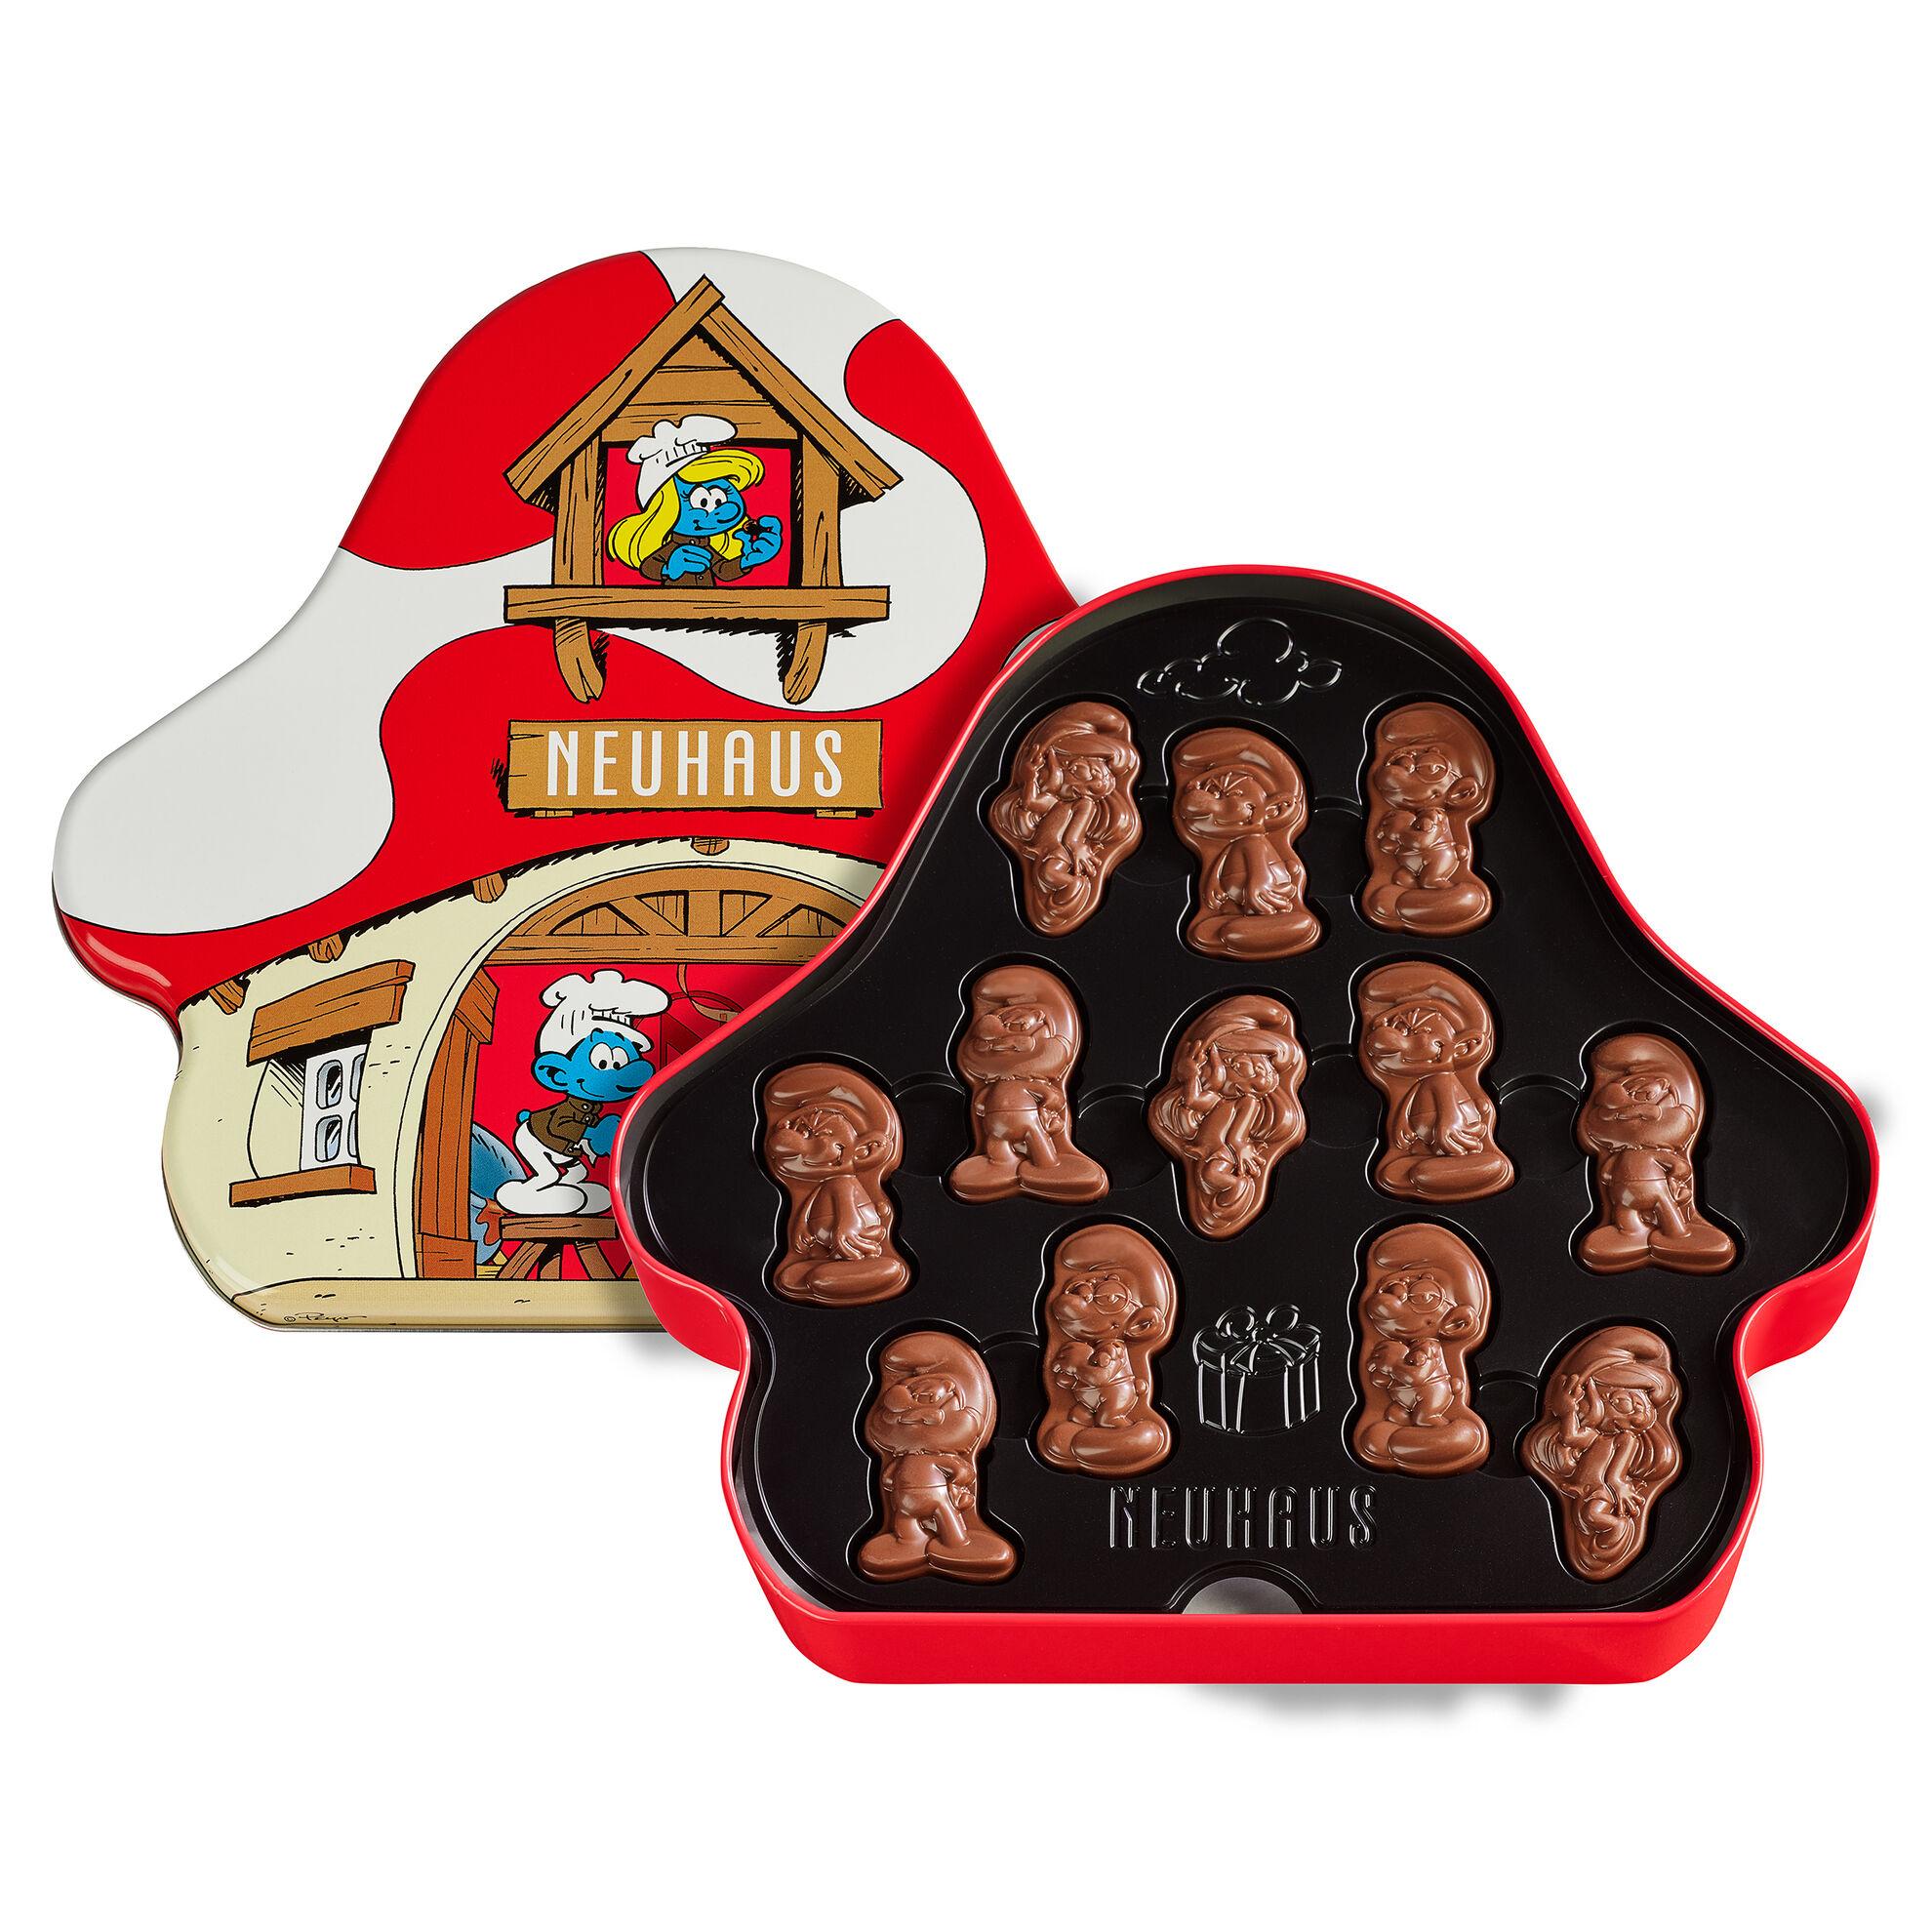 Chocolate Smurfs Mushroom House Tin 24 pcs image number 01